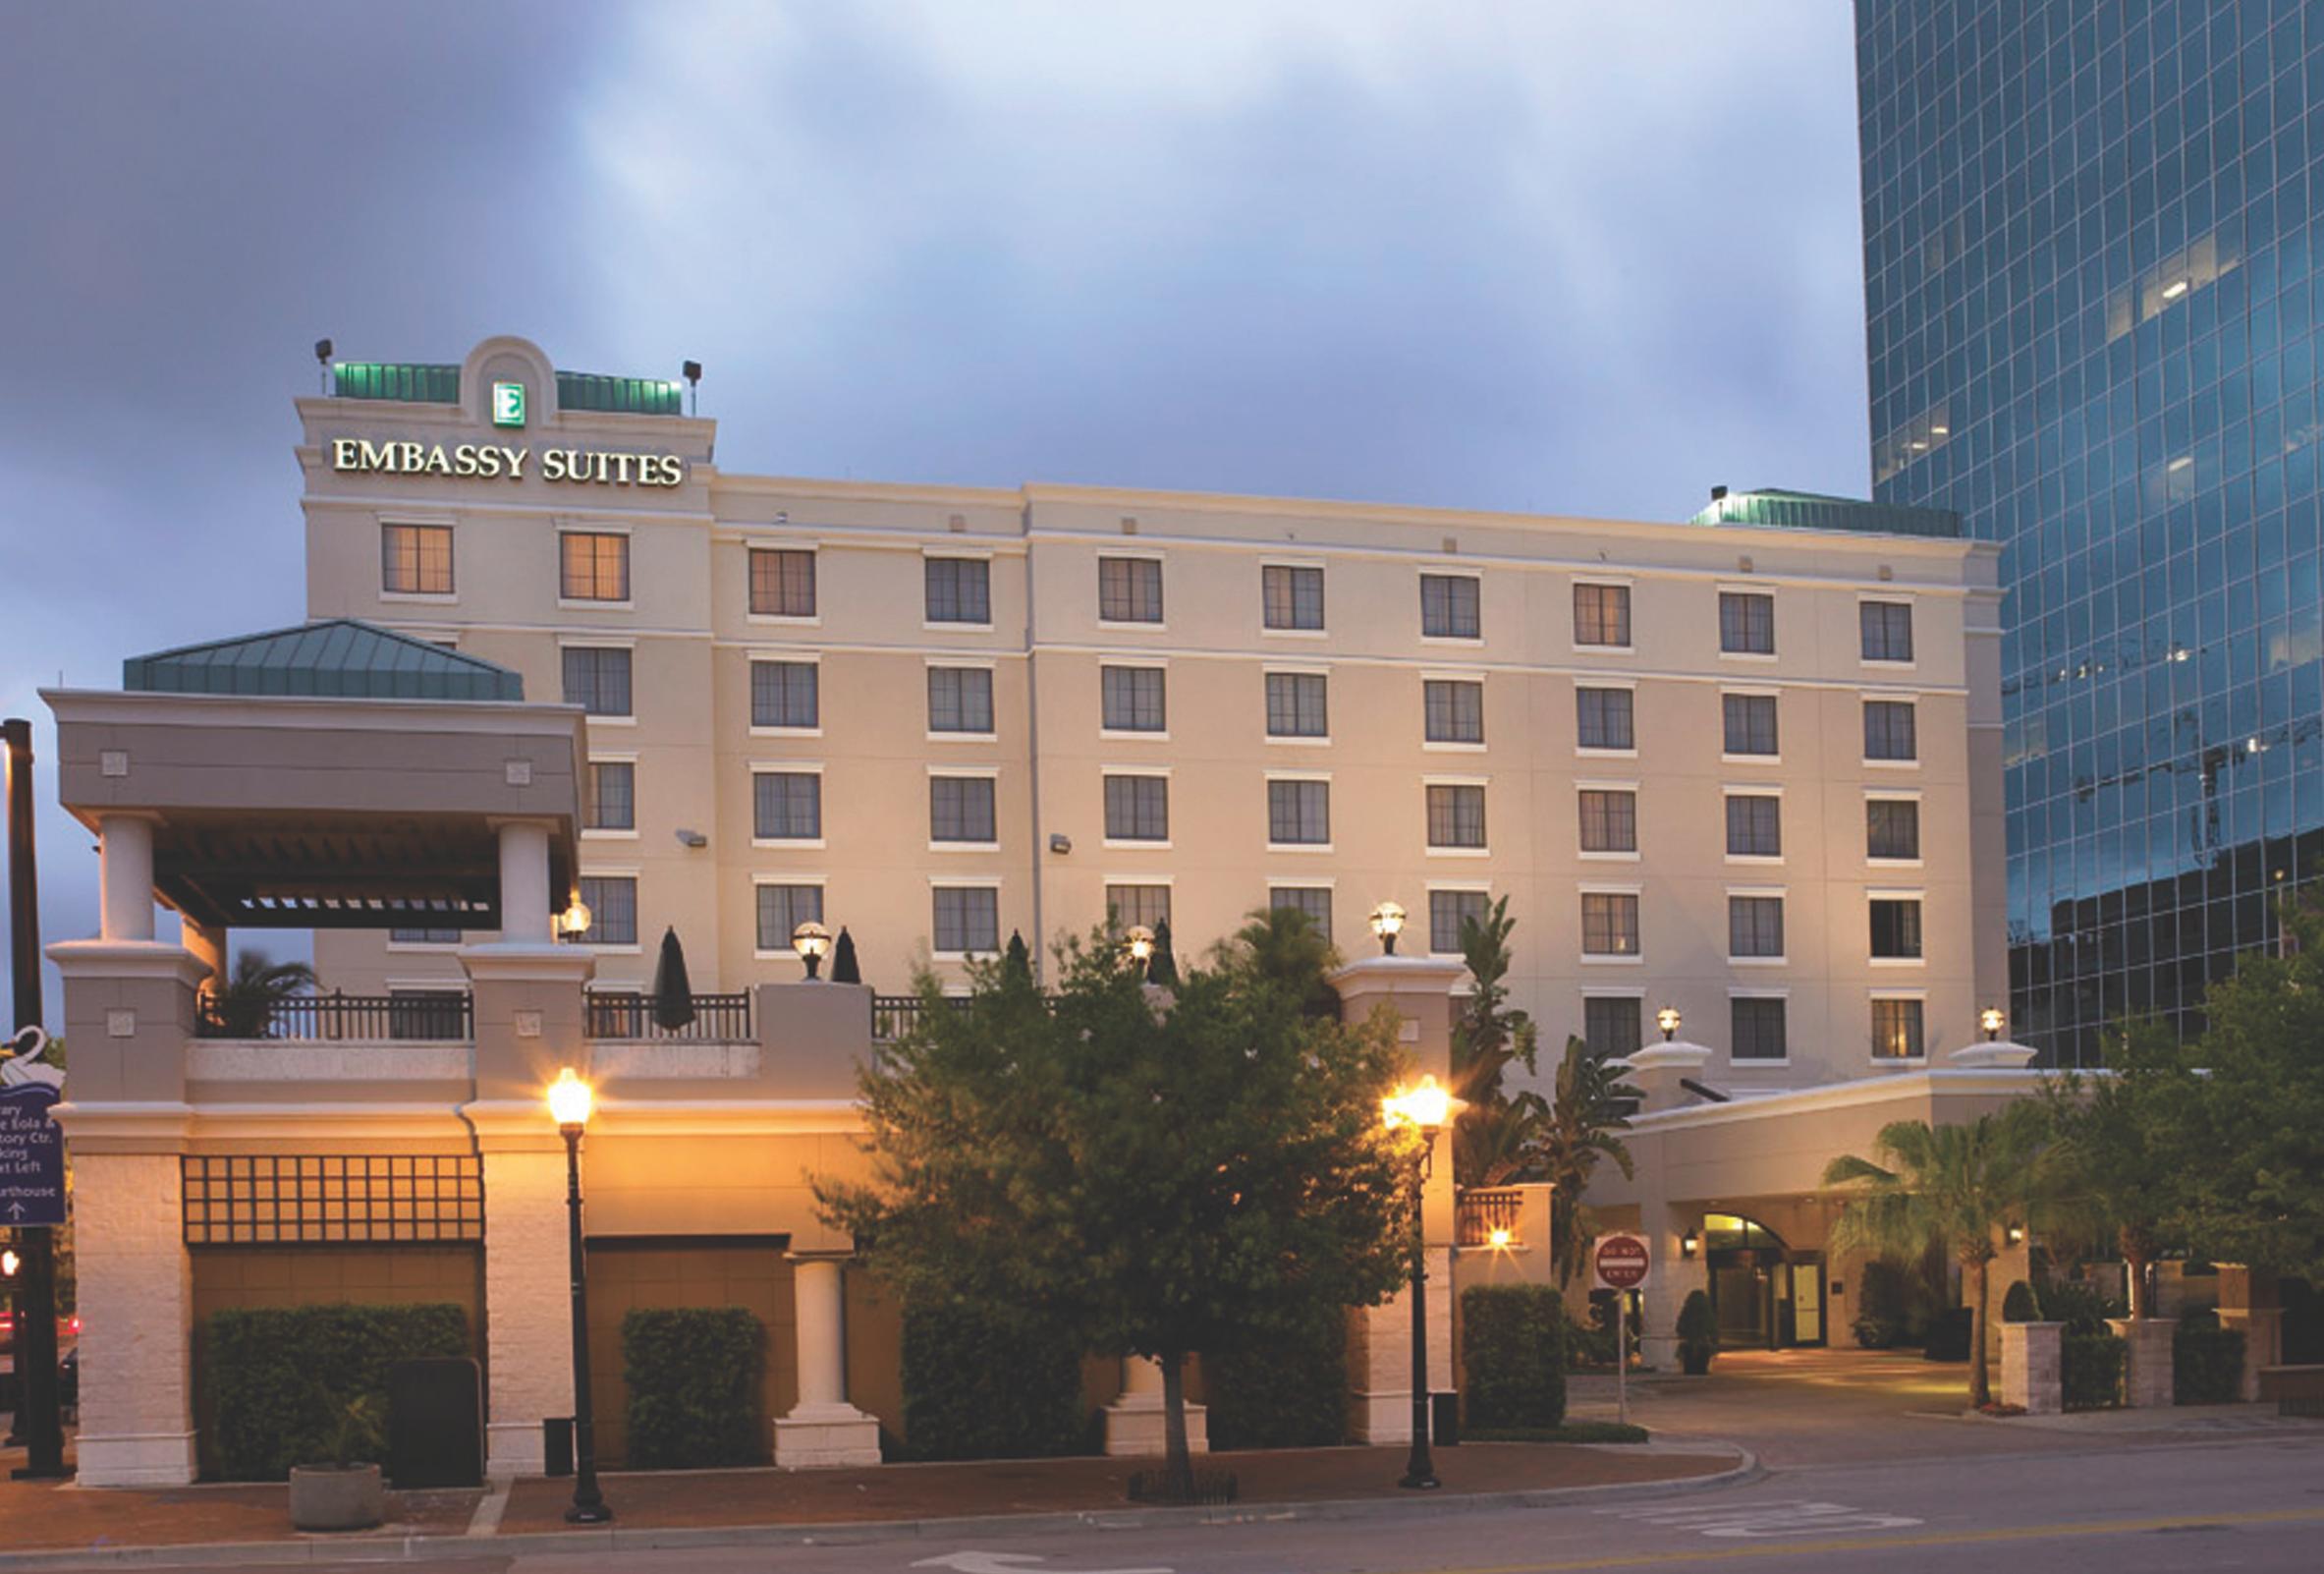 Embassy Suites Orlando Downtown Http Embassysuites3 Hilton Com En Hotels Florida Embassy Suites Orlando D Florida Hotels Autumn Destinations Embassy Suites